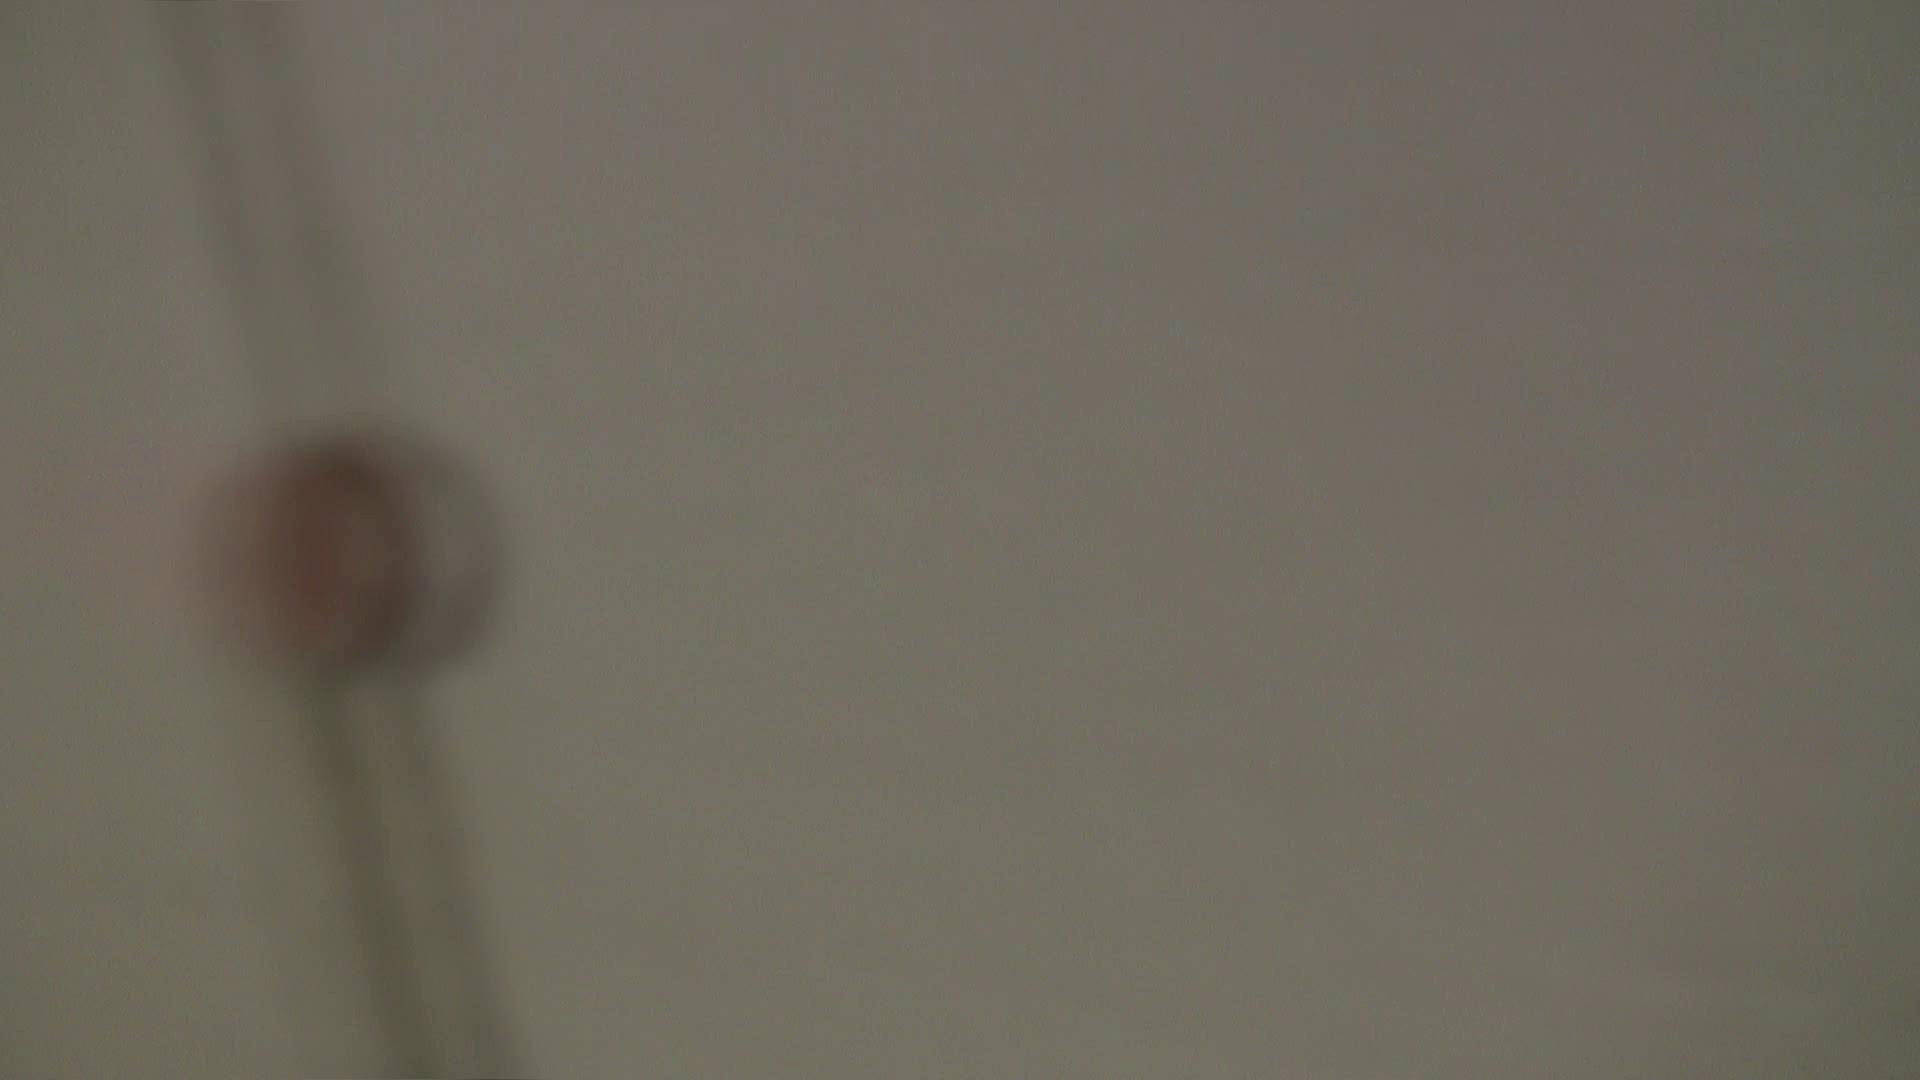 NO.10 小さな穴から一本道を狙う!! シャワー室 盗撮われめAV動画紹介 97pic 62